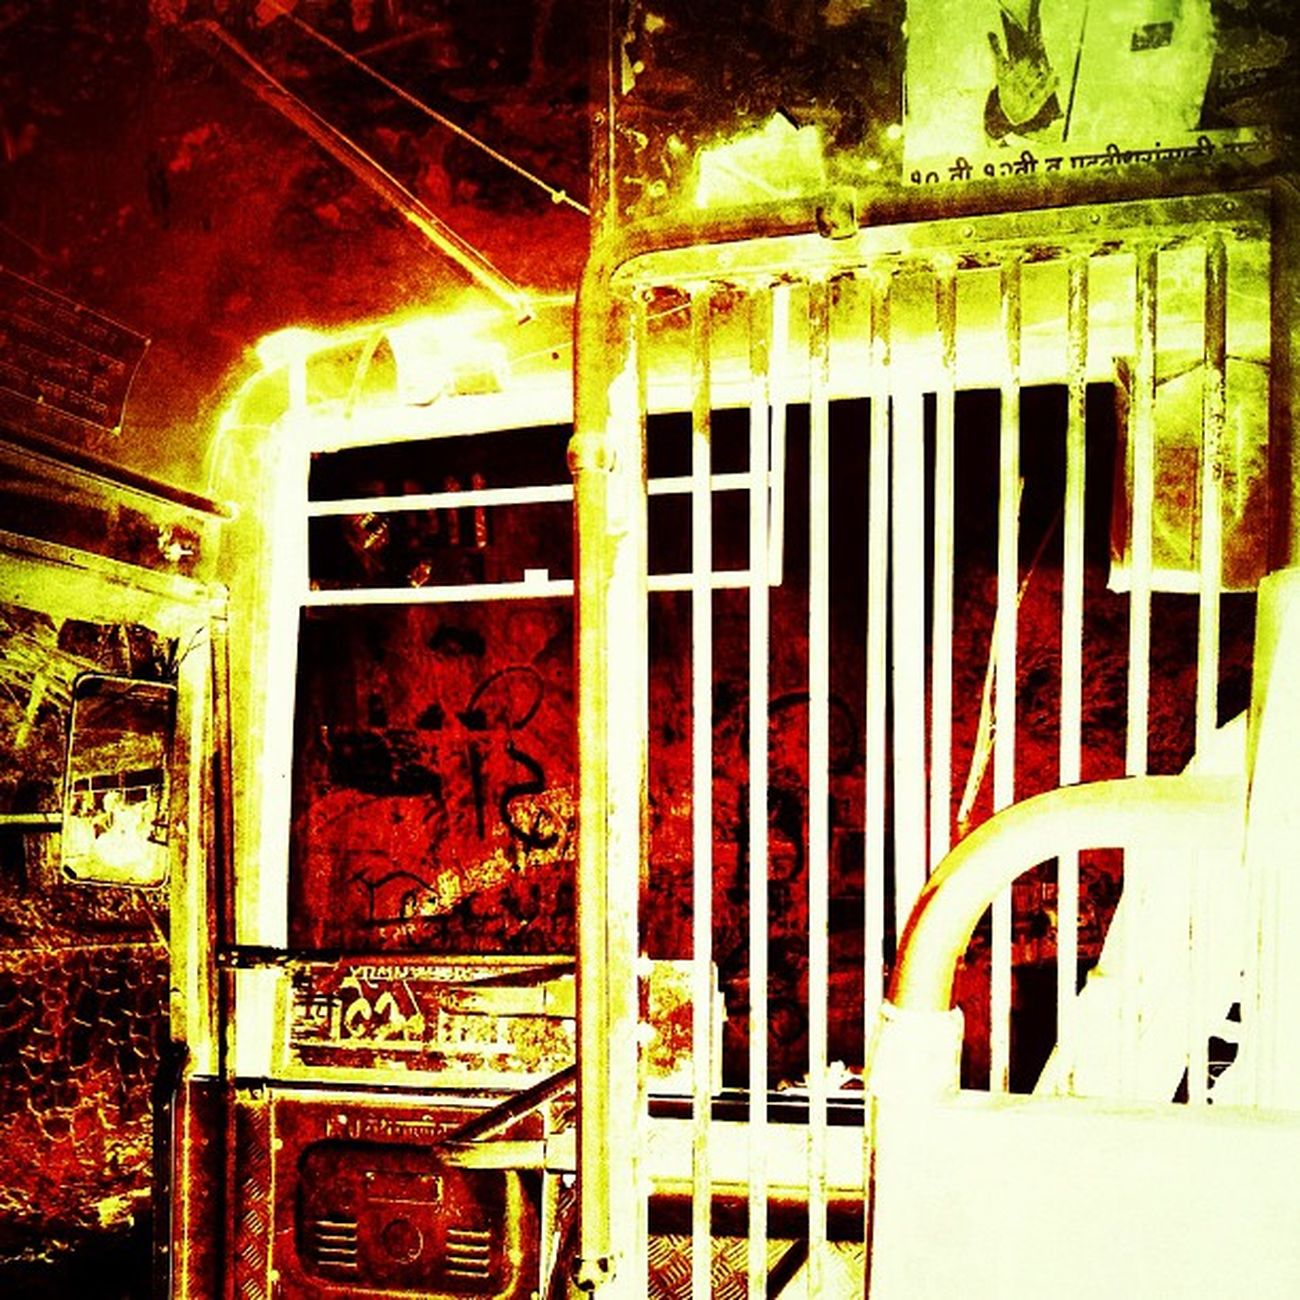 Public Bus in Pune . Onwaytowork Ig23 C0m PMPML